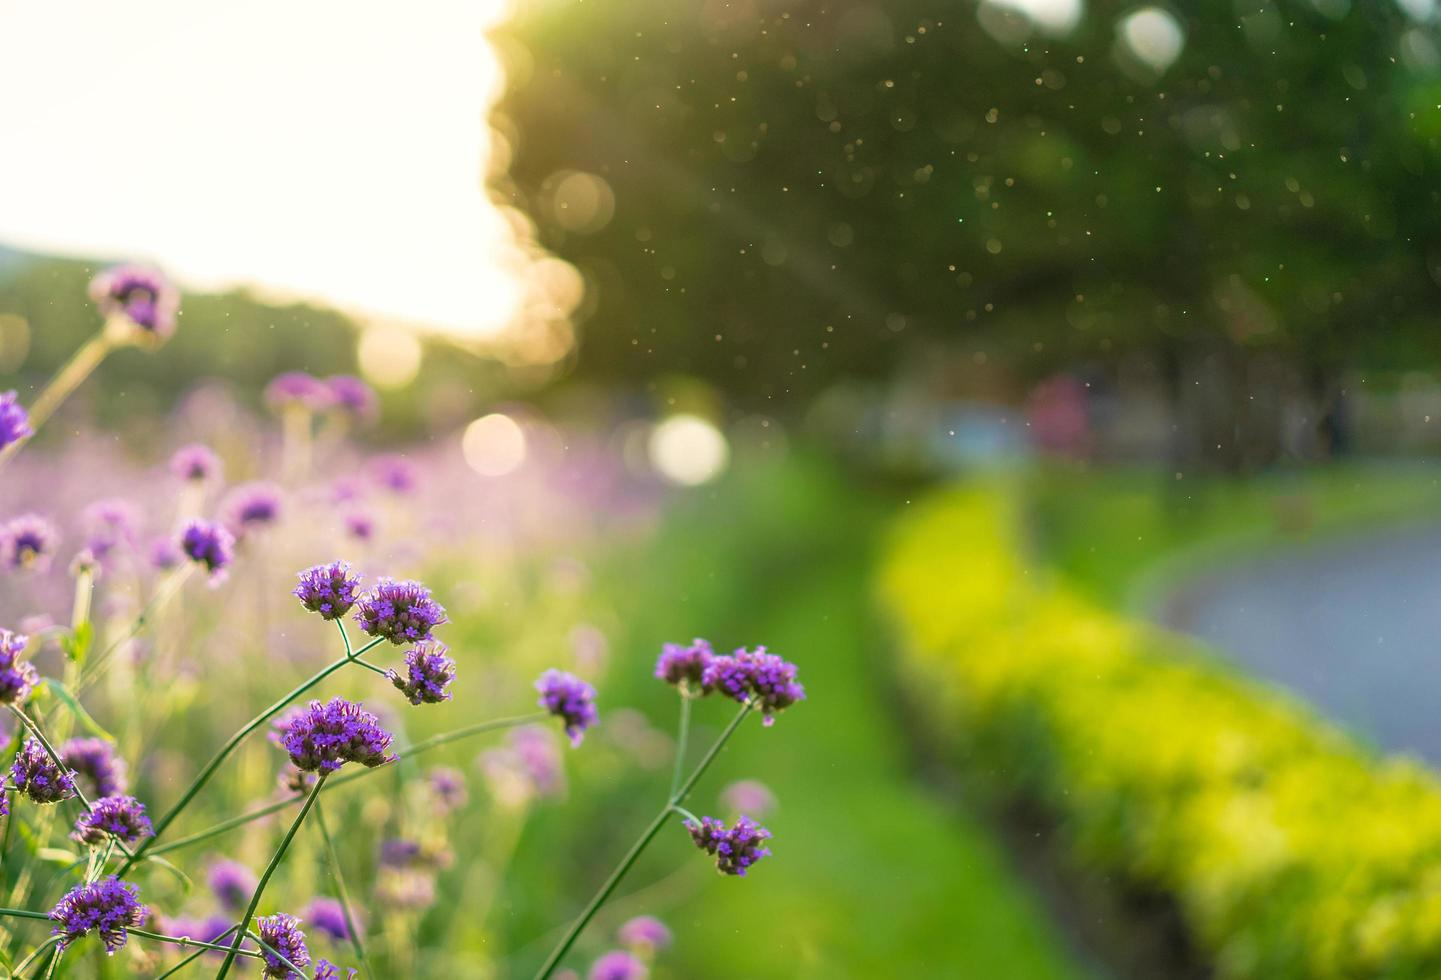 Verbena purple flowers  photo